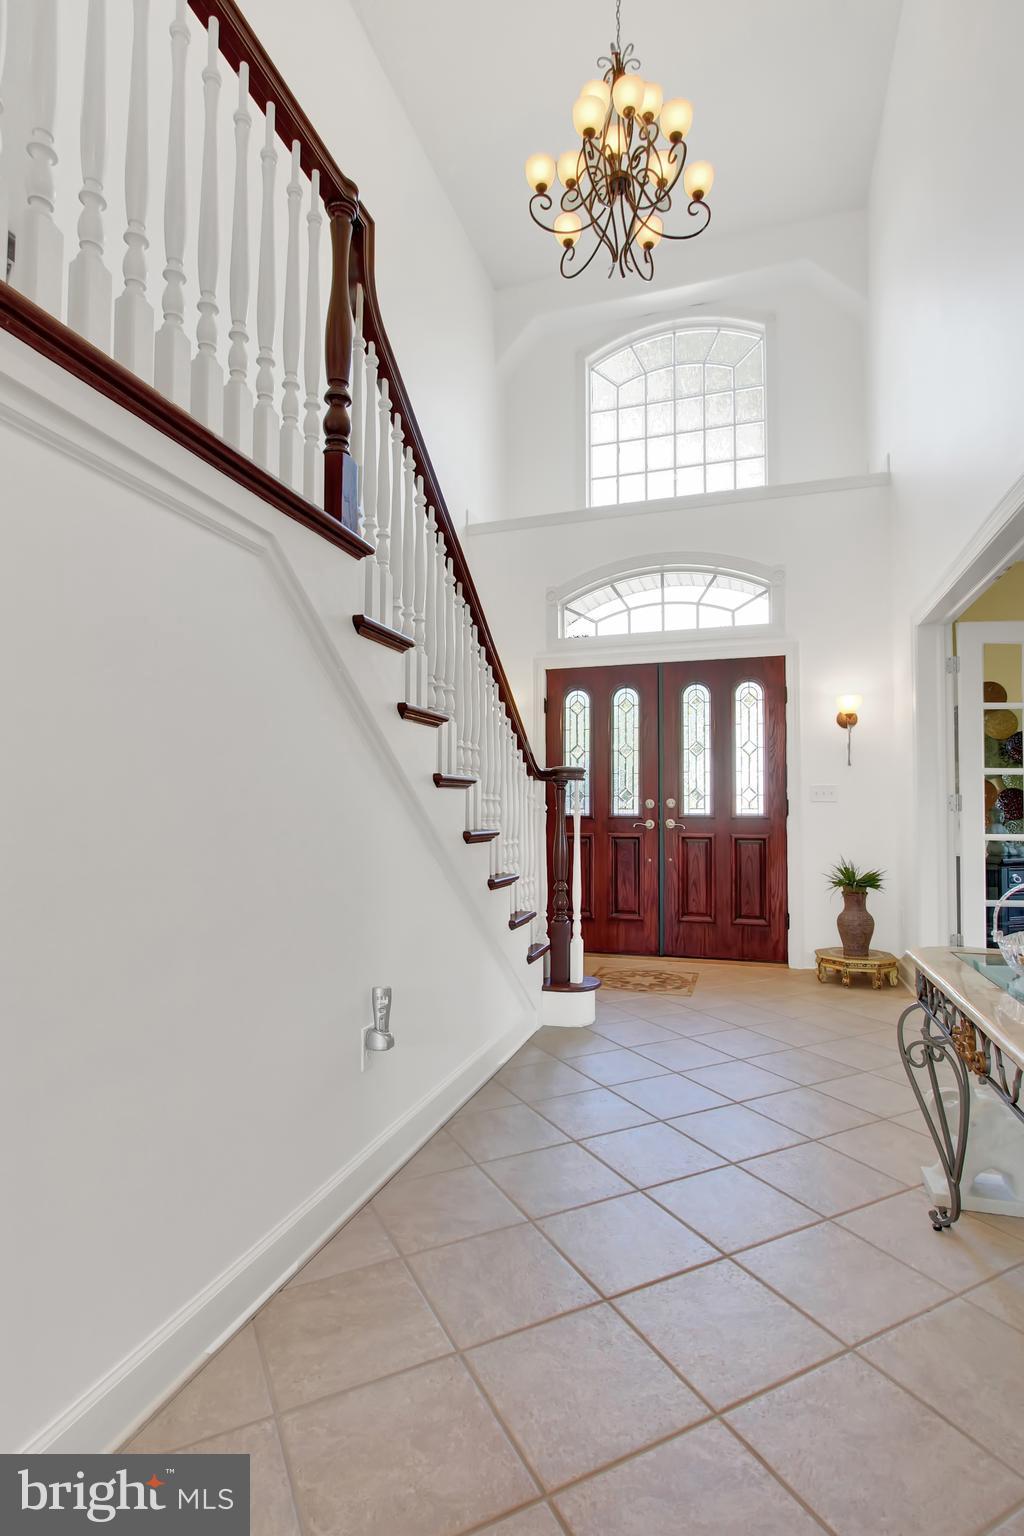 Elaborate chandelier, tiled flooring, open layout